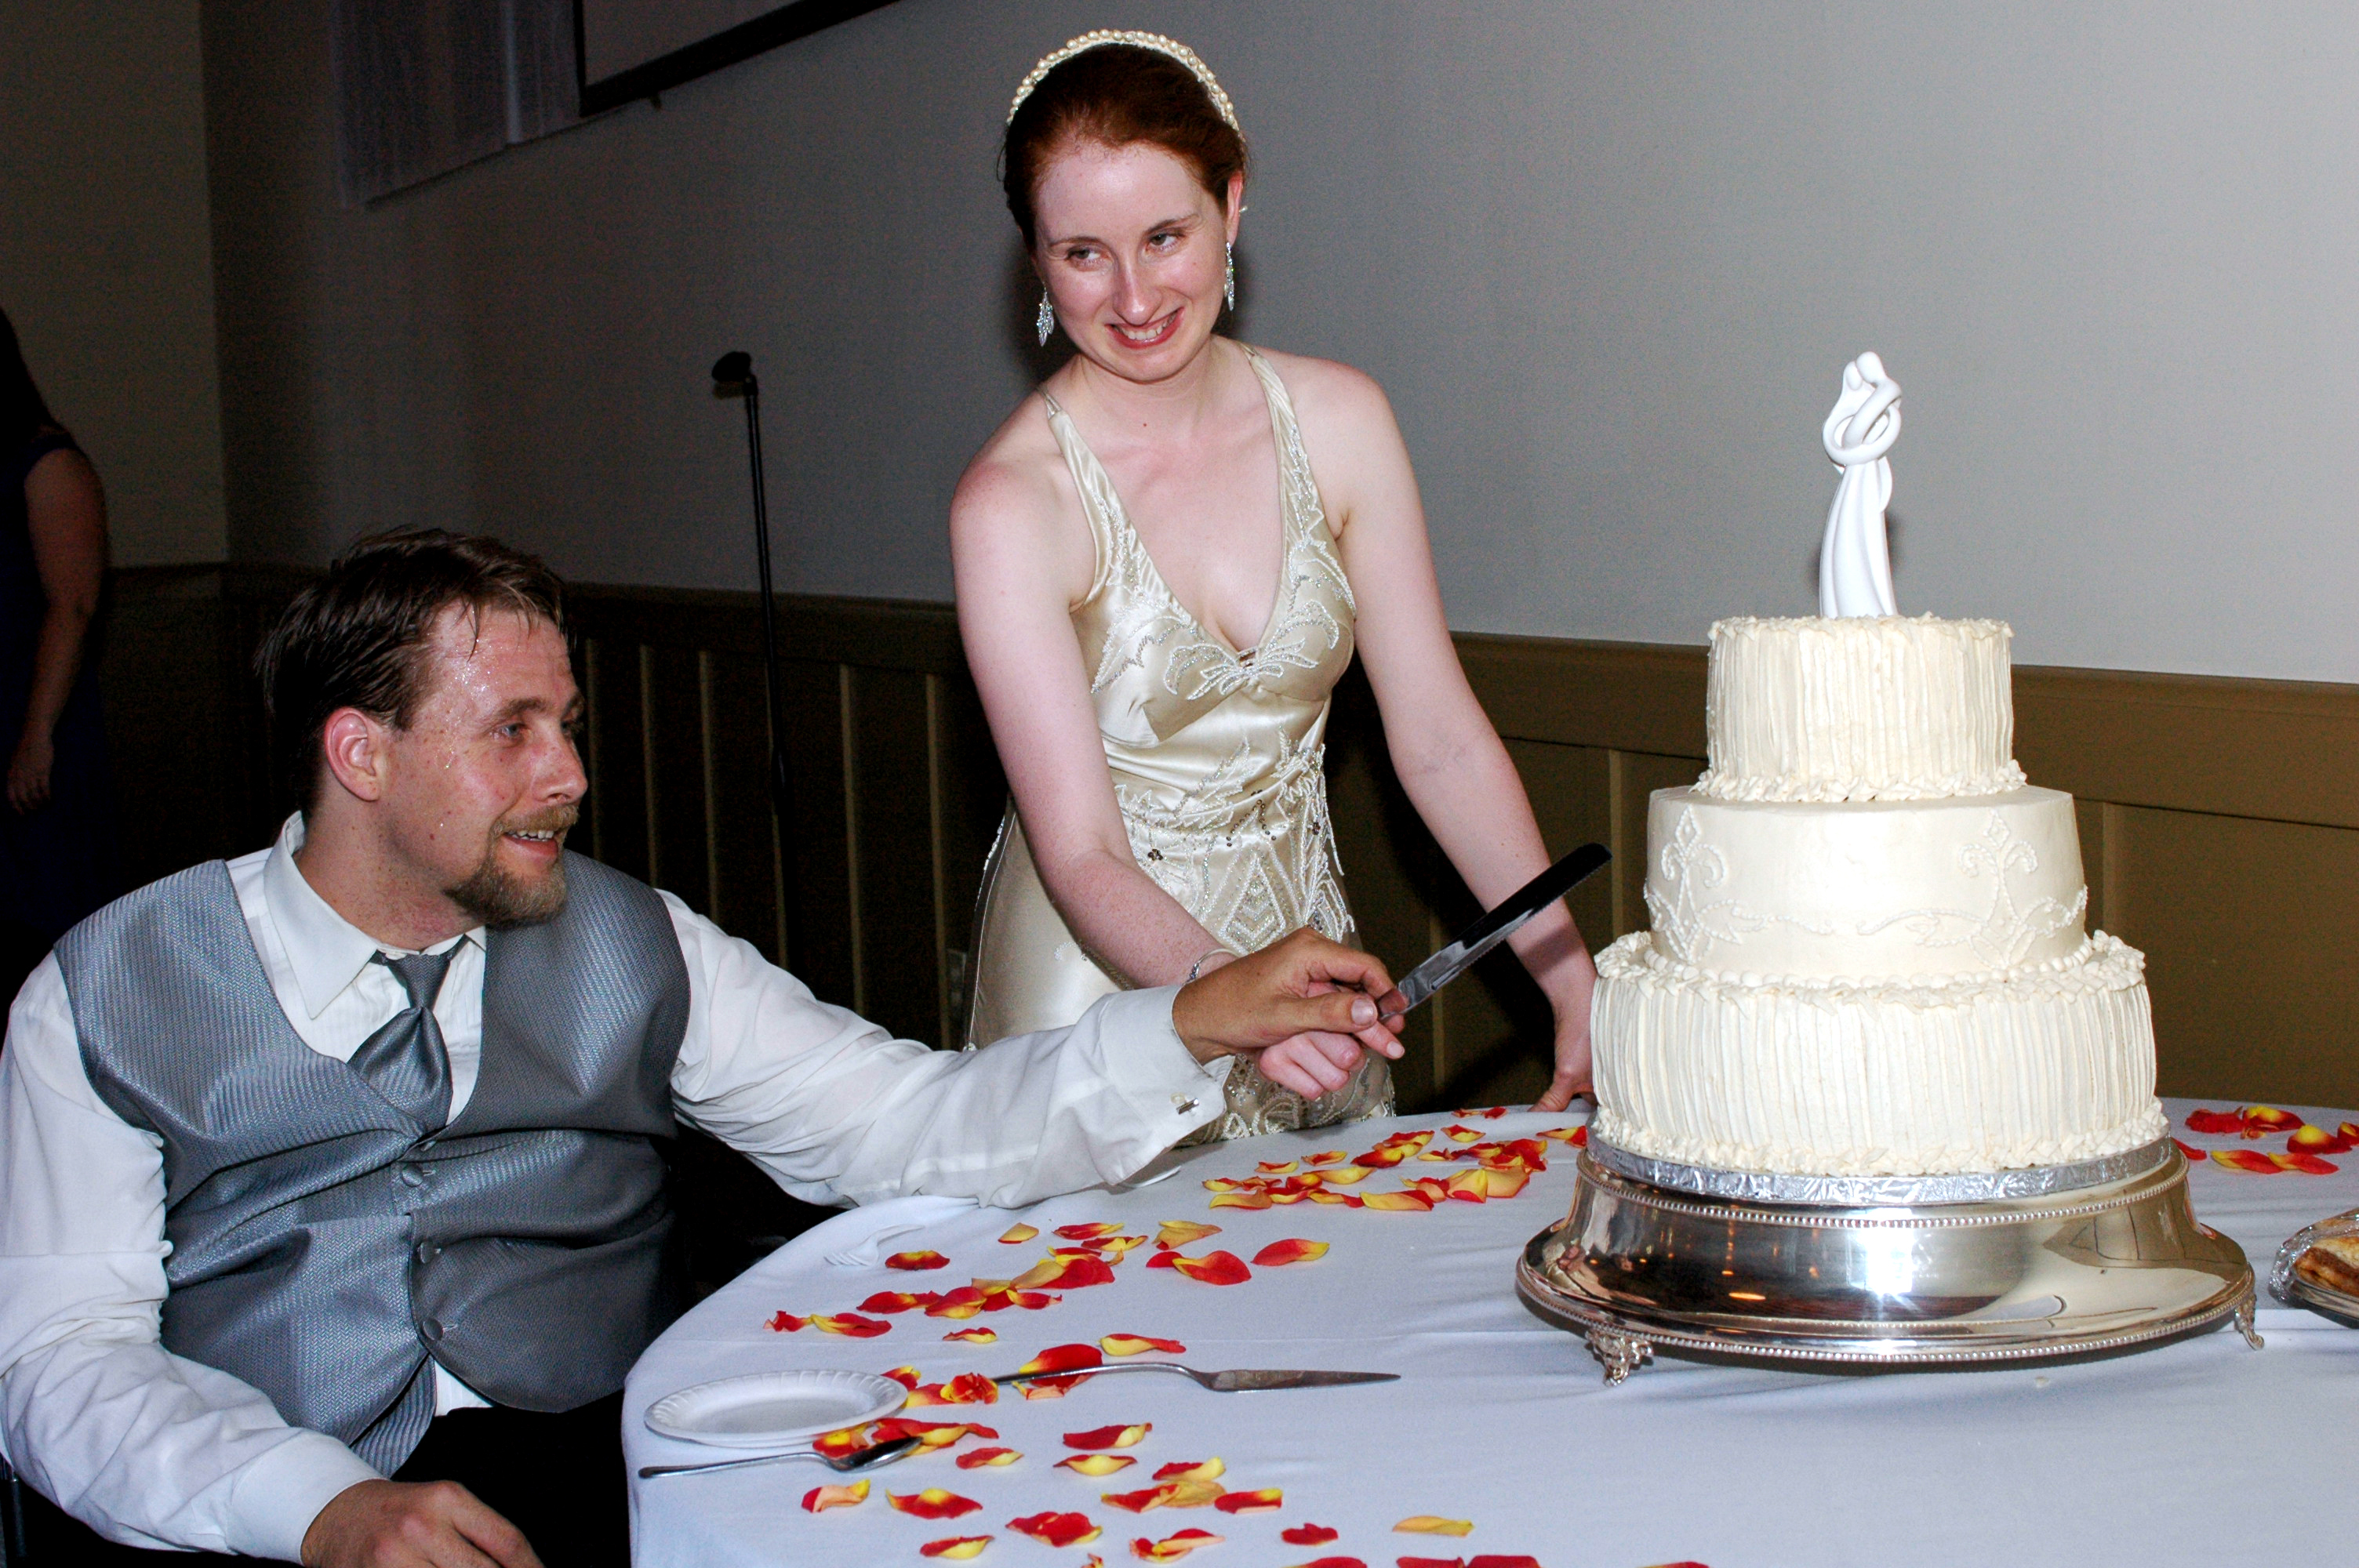 Cakes, orange, silver, cake